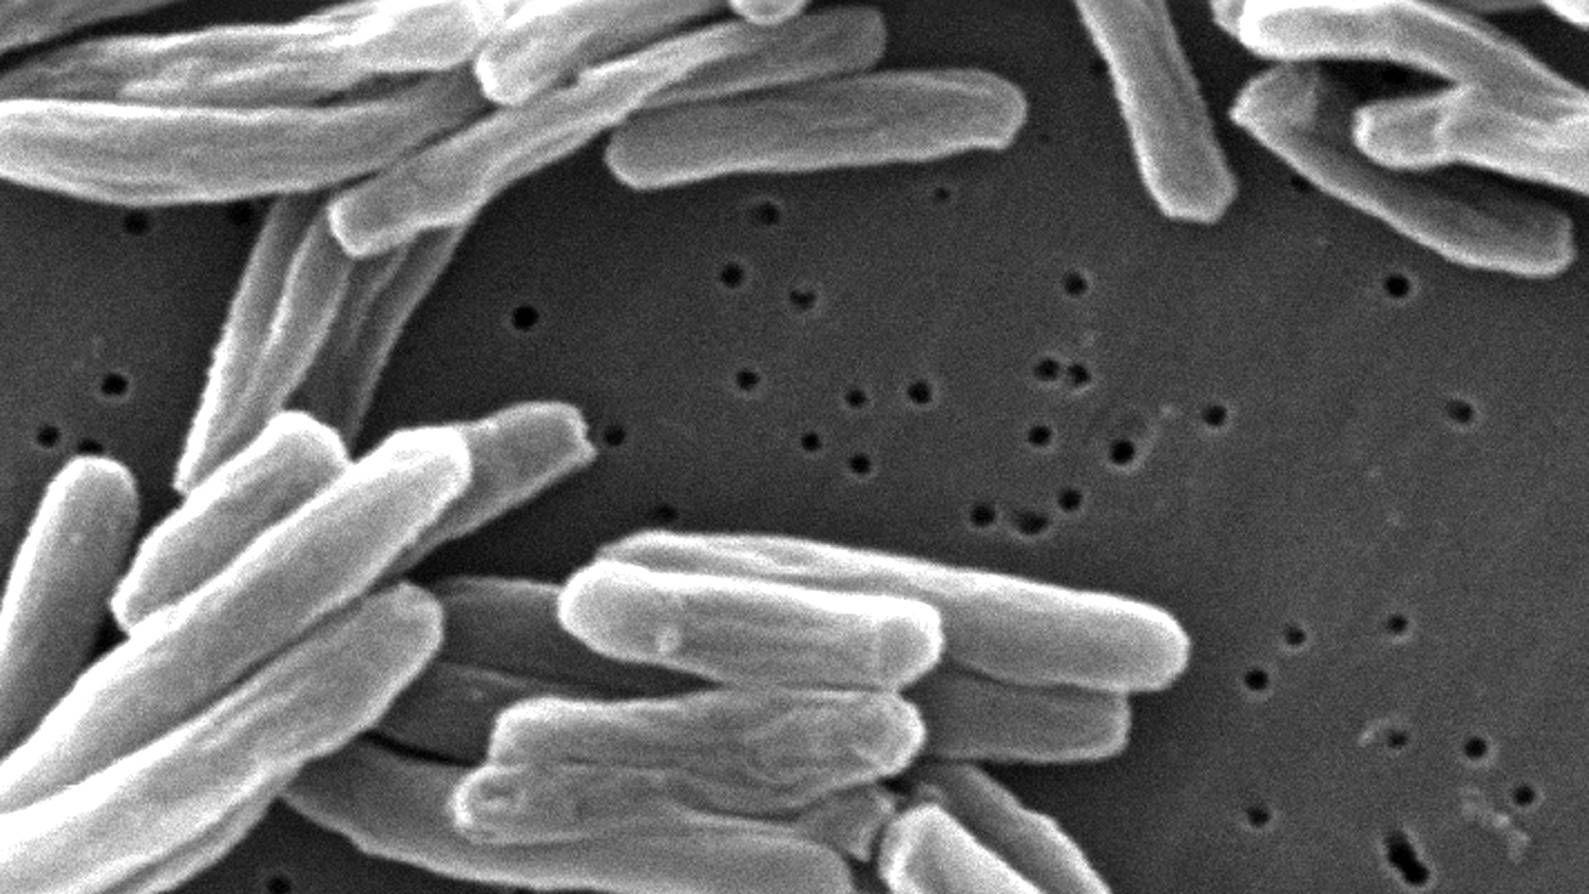 Микробактерия туберкулеза под микроскопом.